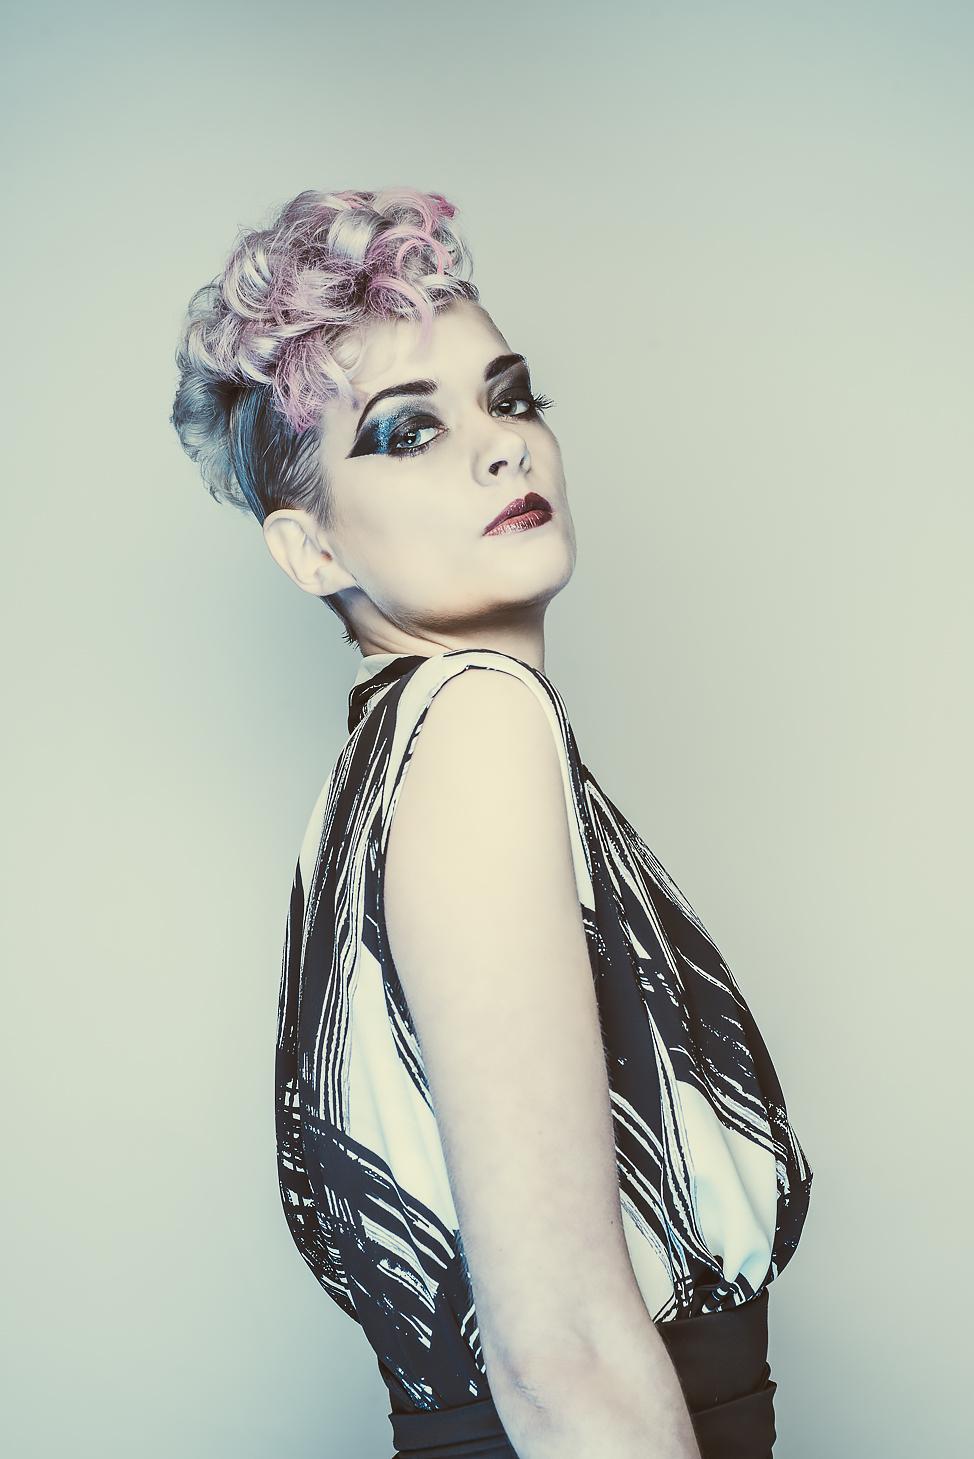 zaramia-ava-zaramiaava-leeds-fashion-designer-ethical-sustainable-tailored-minimalist-emi-print-black-belt-versatile-drape-cowl-styling-womenswear-models-photoshoot-shrine-hairdressers-67